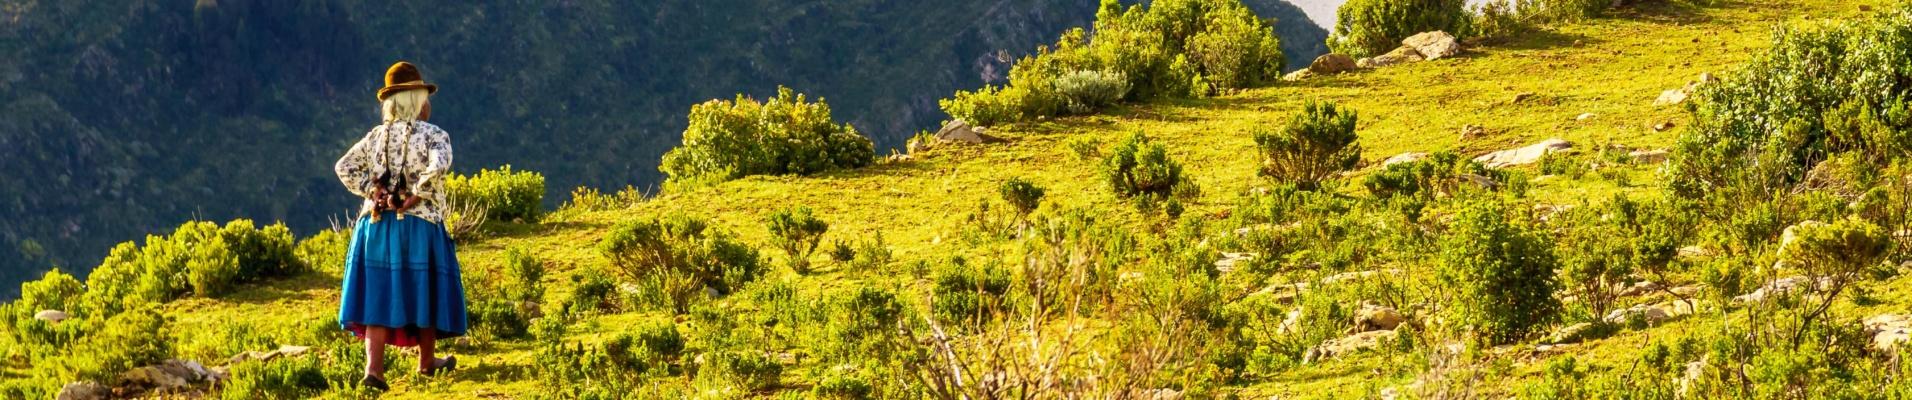 Lac titicaca et Cholitas